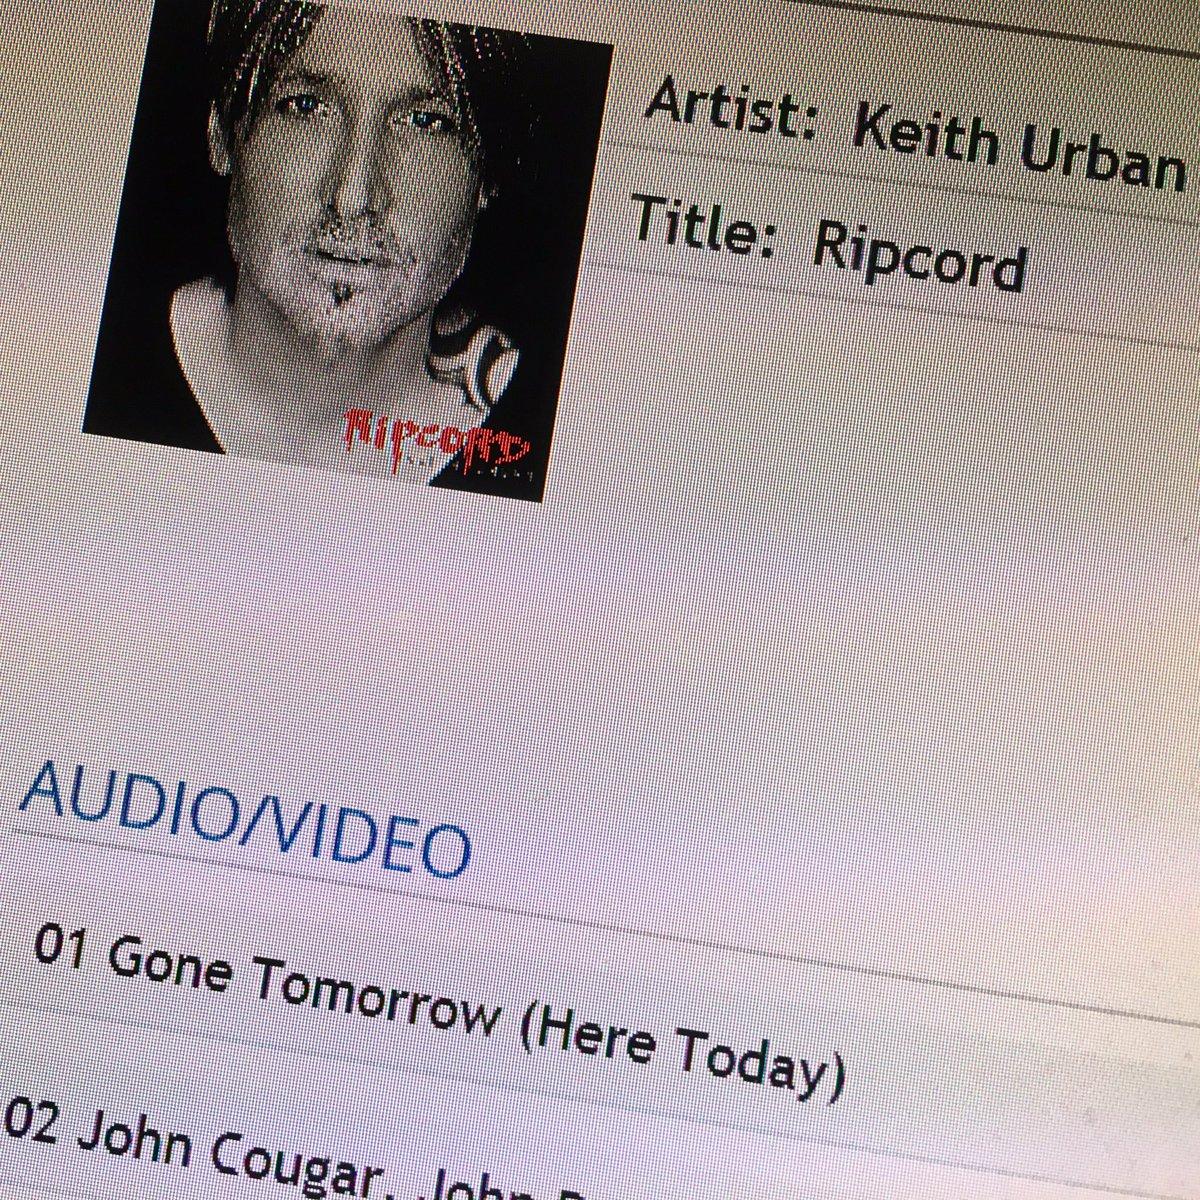 take my word-new @KeithUrban = legit. #thefighter w/ @carrieunderwood so good. #ripcord #KeithUrban #CarrieUnderwood https://t.co/LL42wwduGL